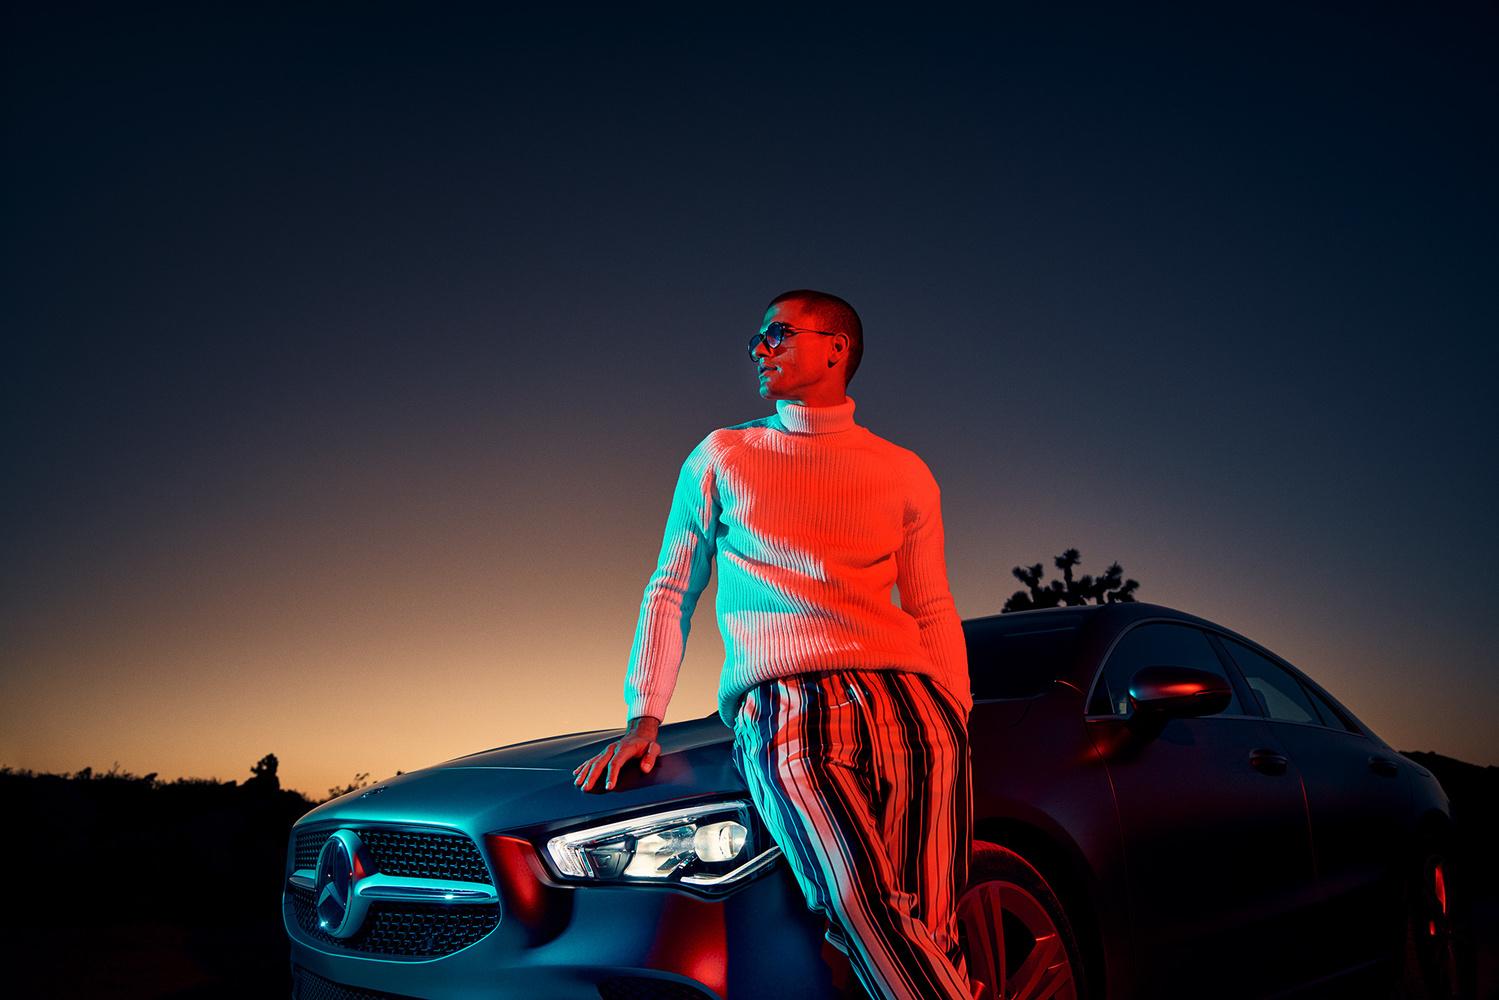 Mercedes Benz CLA by Dmitry Bocharov